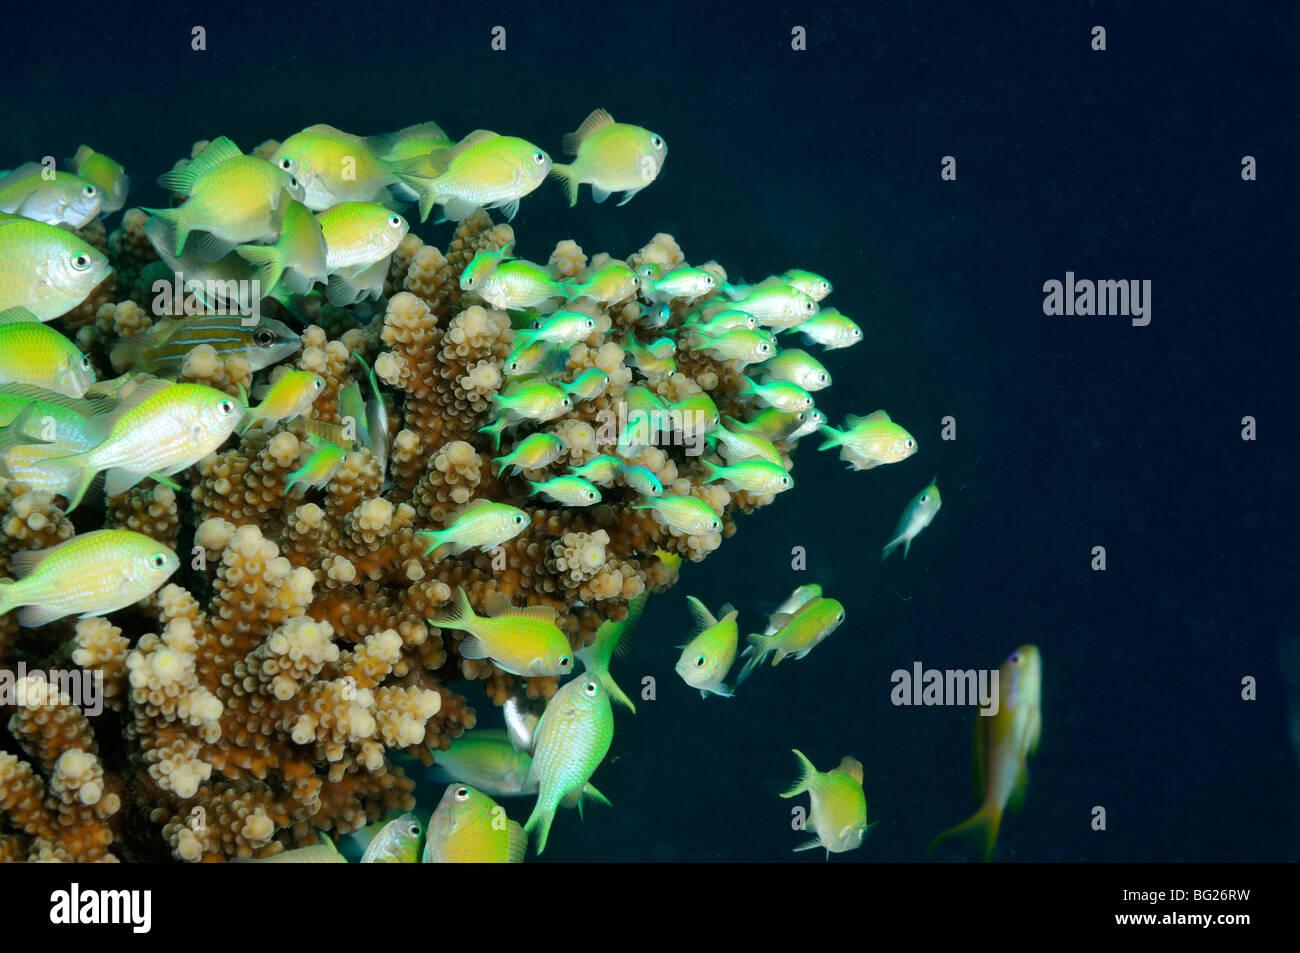 Bluegreen chromis fish, Chromis viridis, on Acropora lamarcki coral of reef, 'Red Sea' - Stock Image